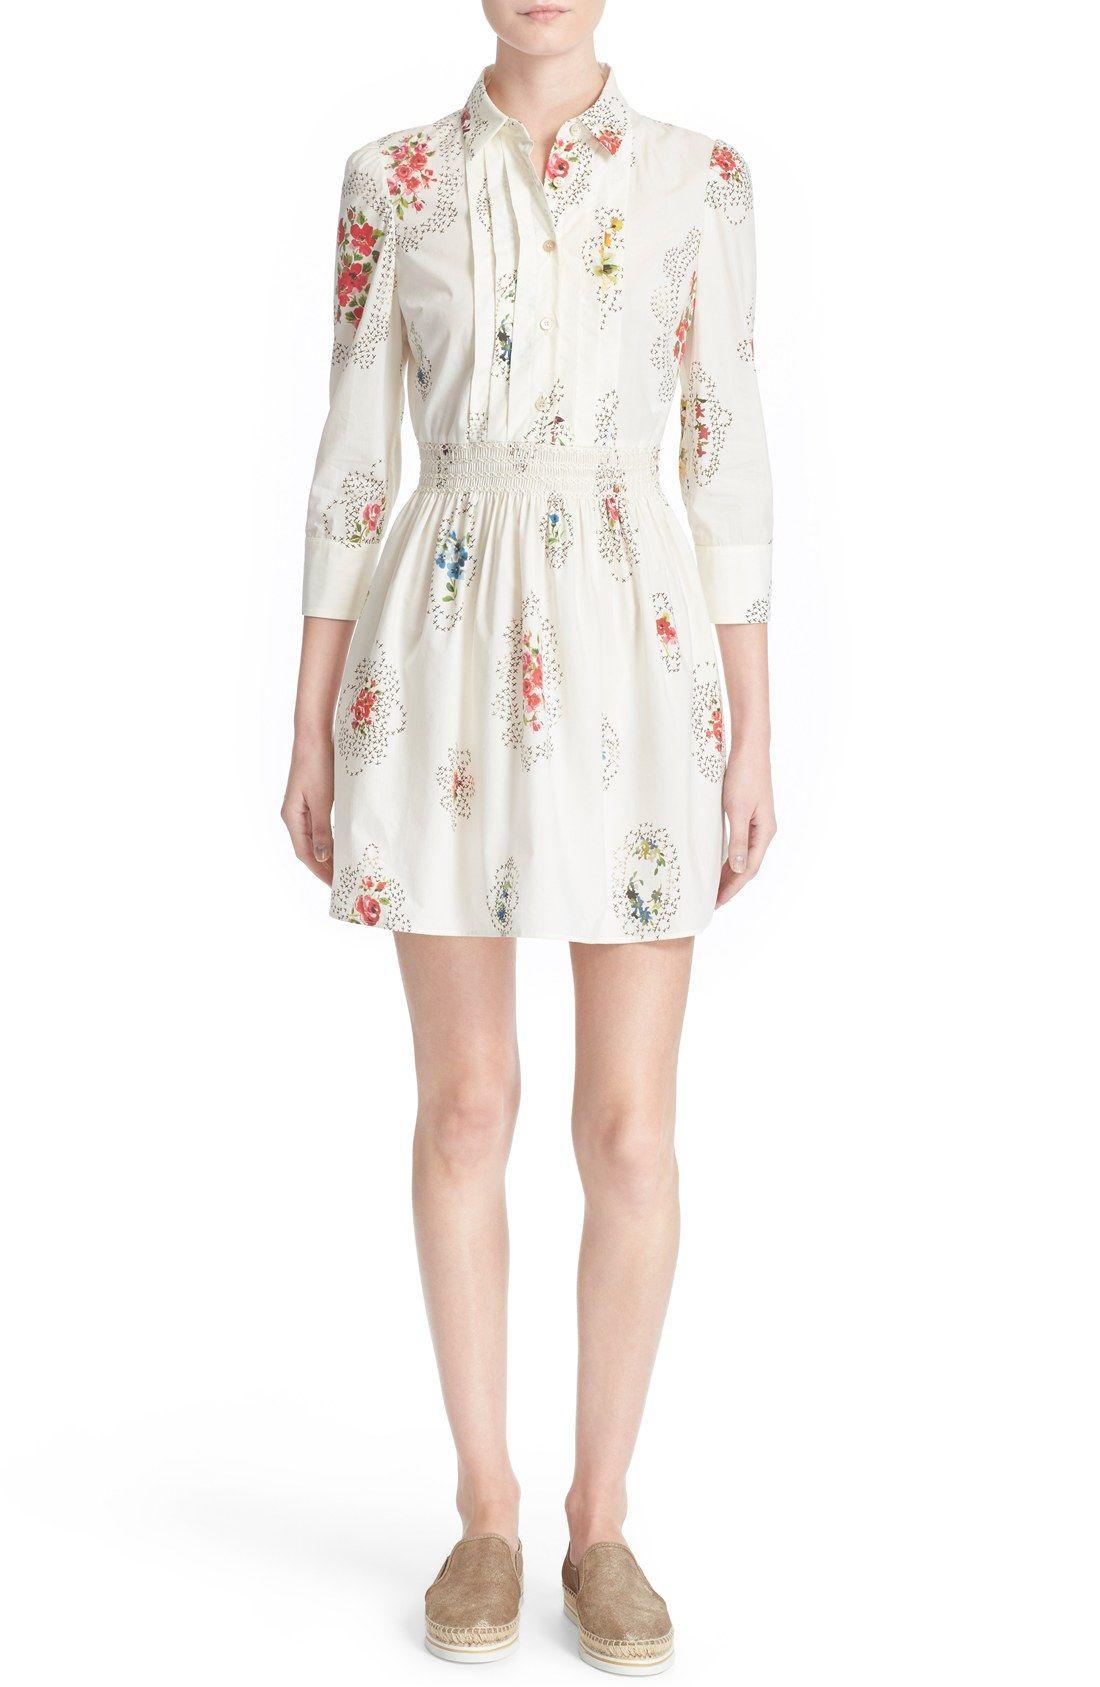 RED Valentino Framed Floral Print Cotton Dress